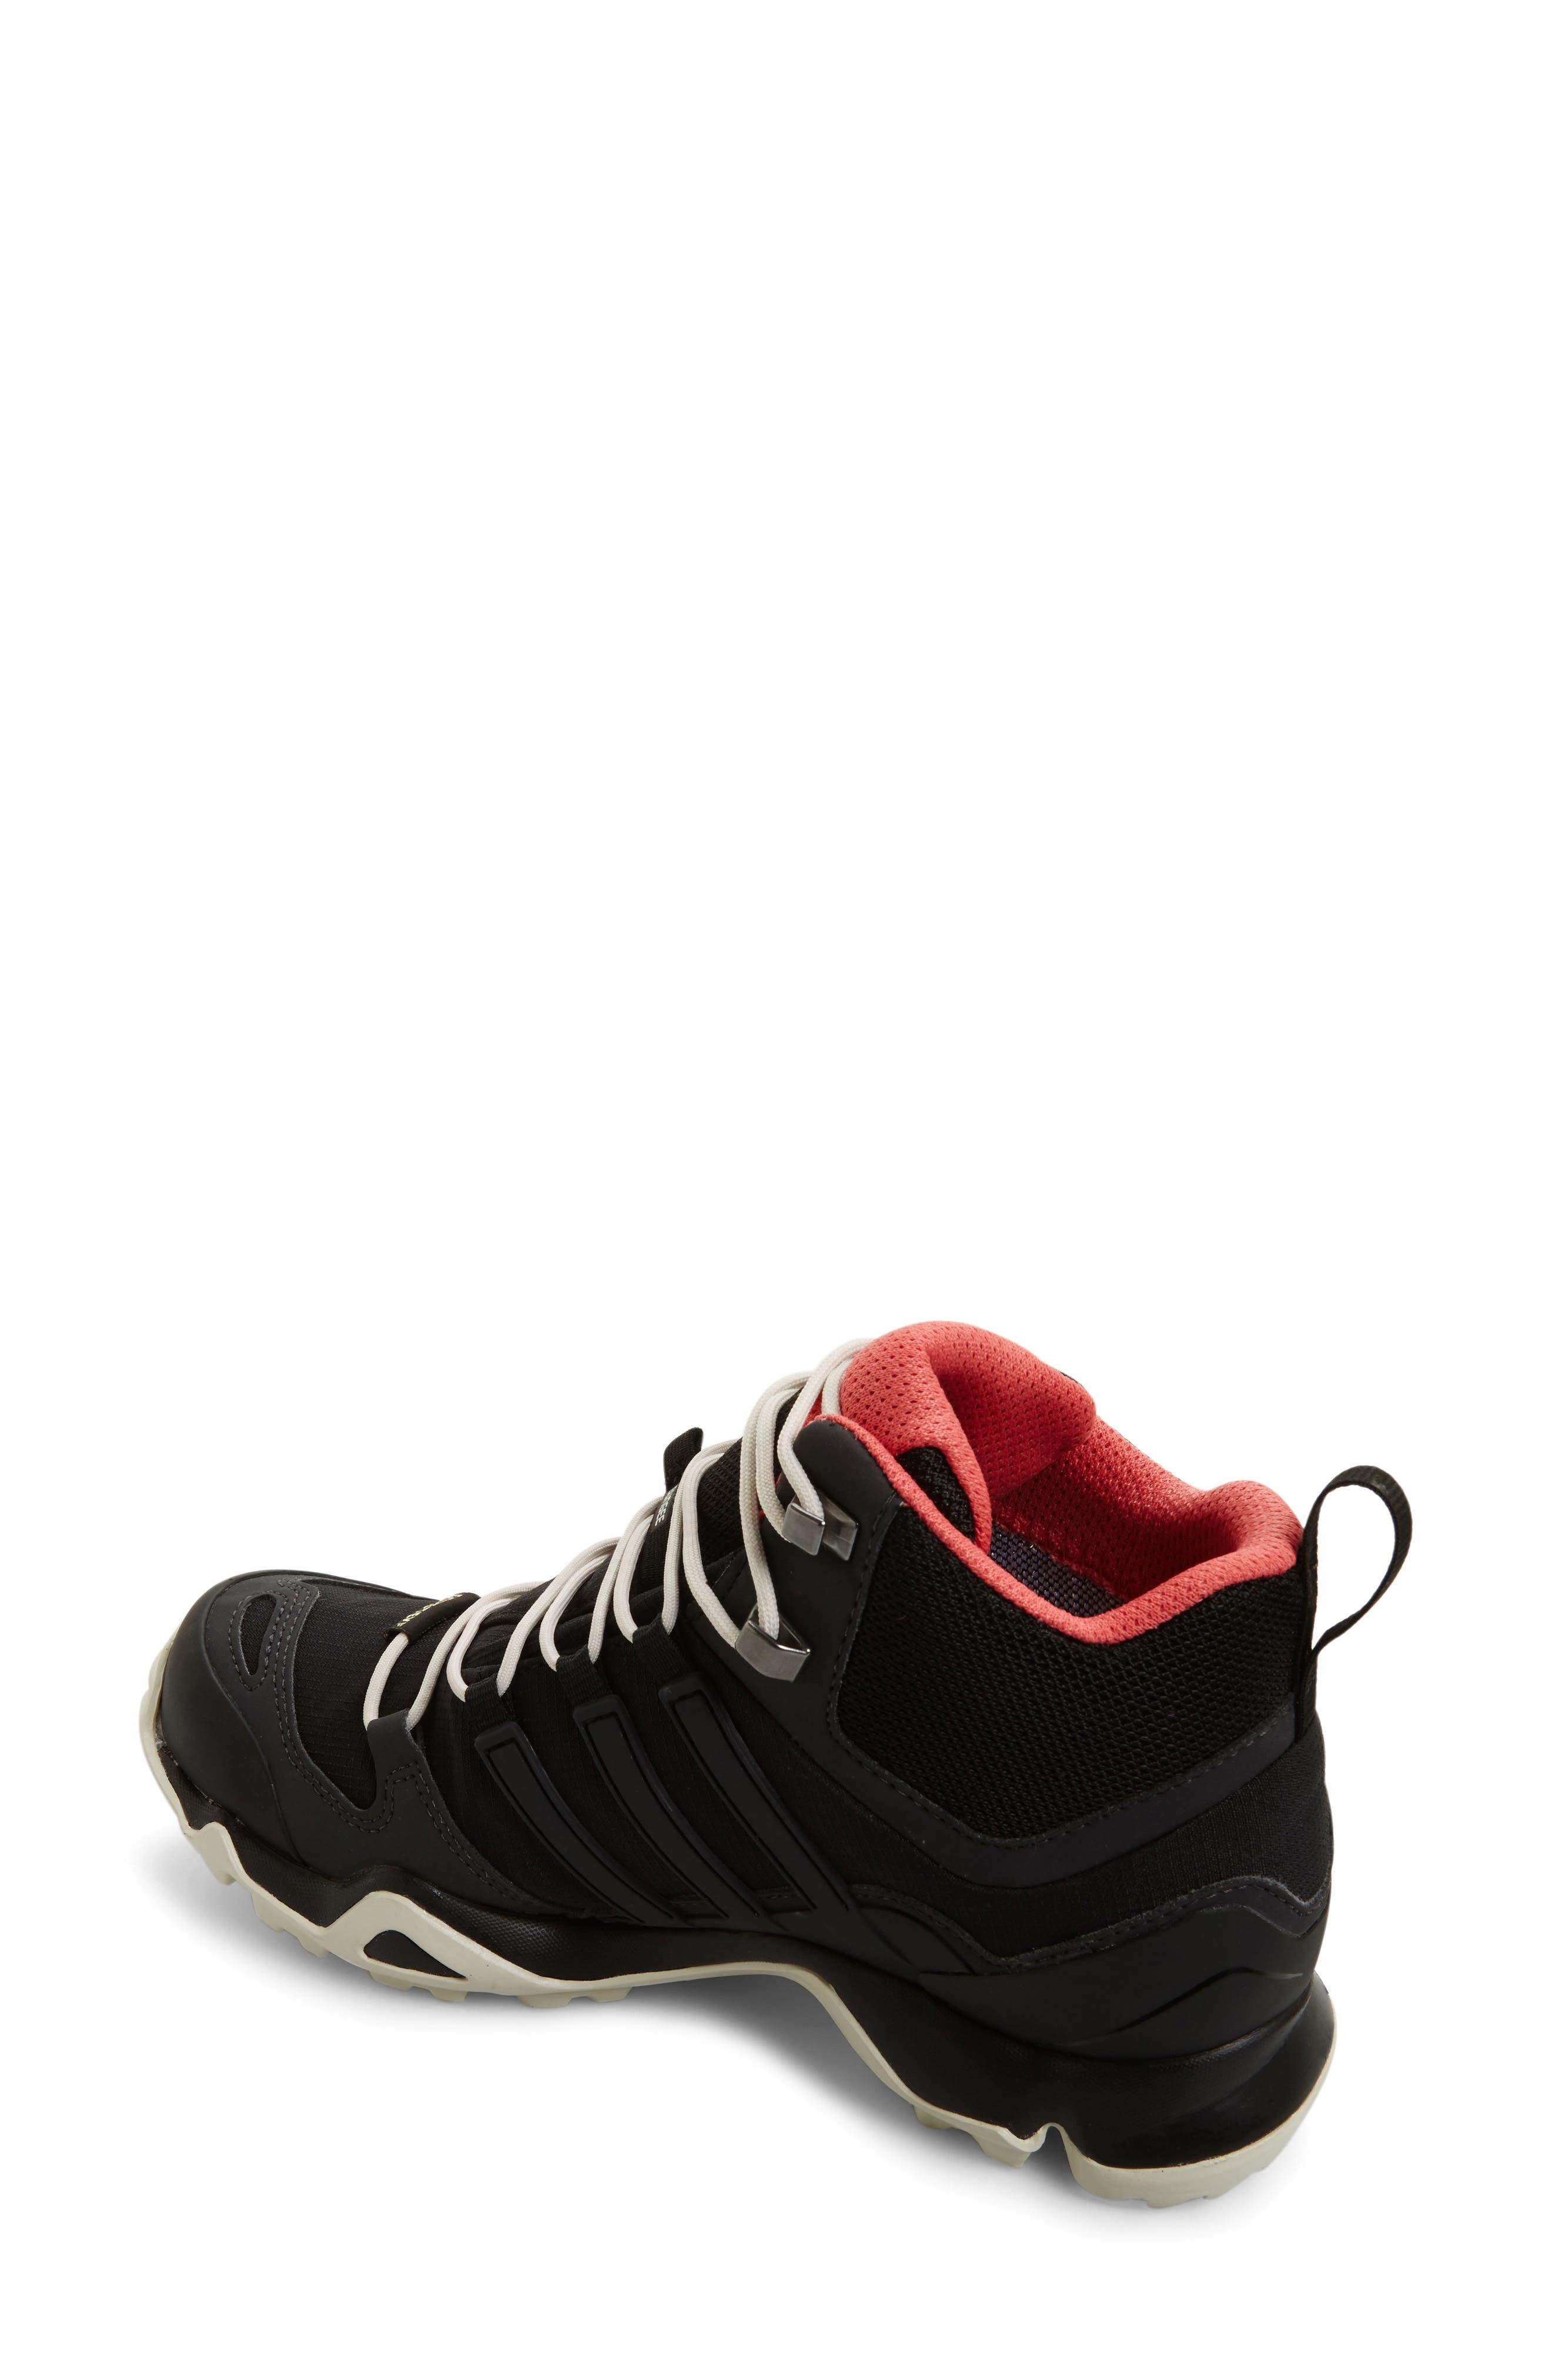 Alternate Image 2  - adidas Terrex Swift R GTX Mid Hiking Boot (Women)